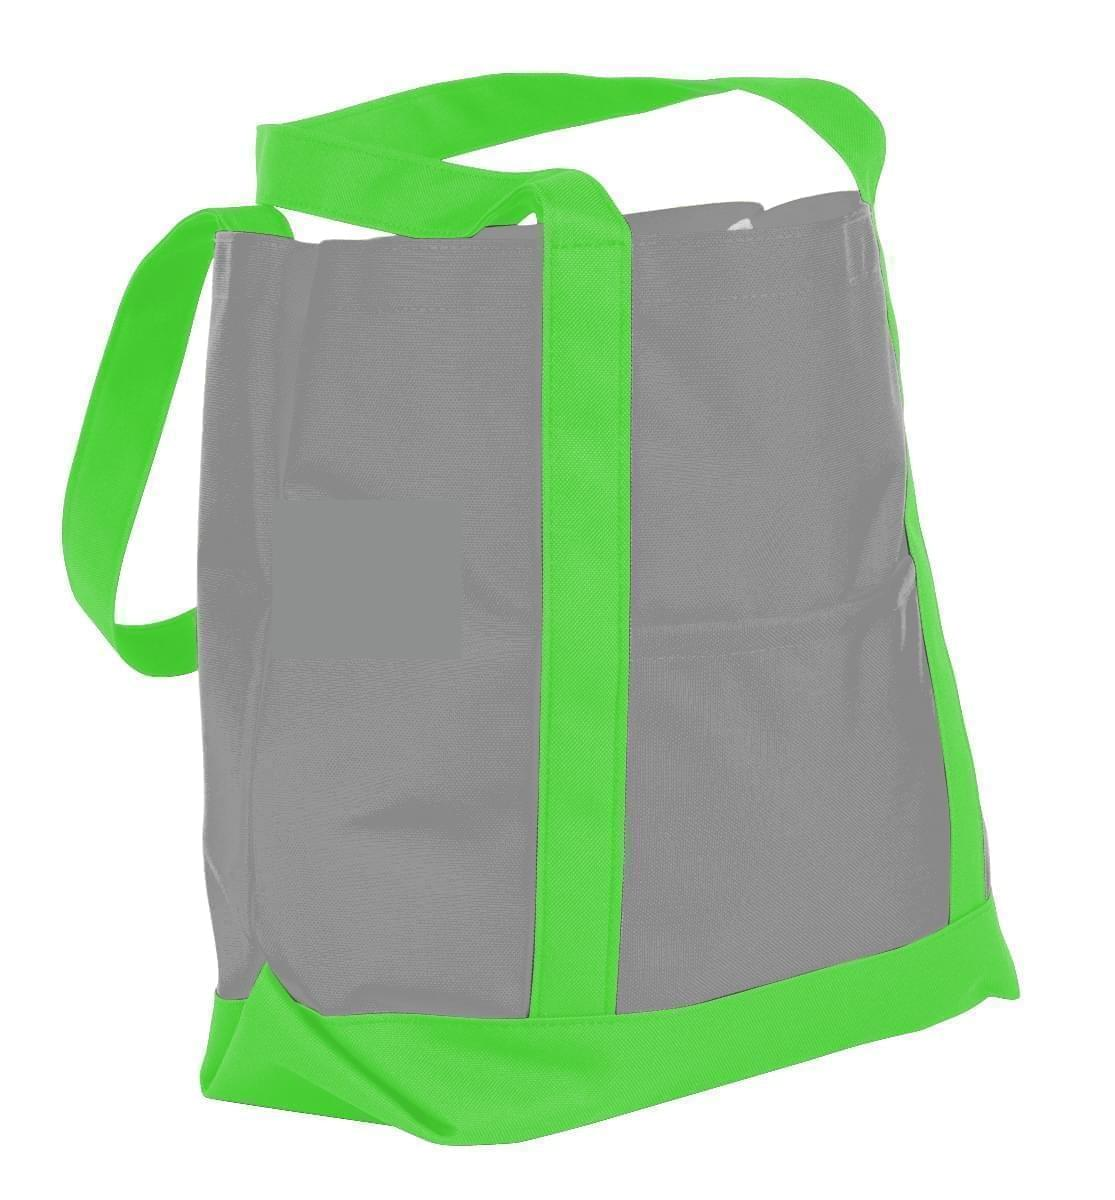 USA Made Nylon Poly Boat Tote Bags, Grey-Lime, XAACL1UA1Y